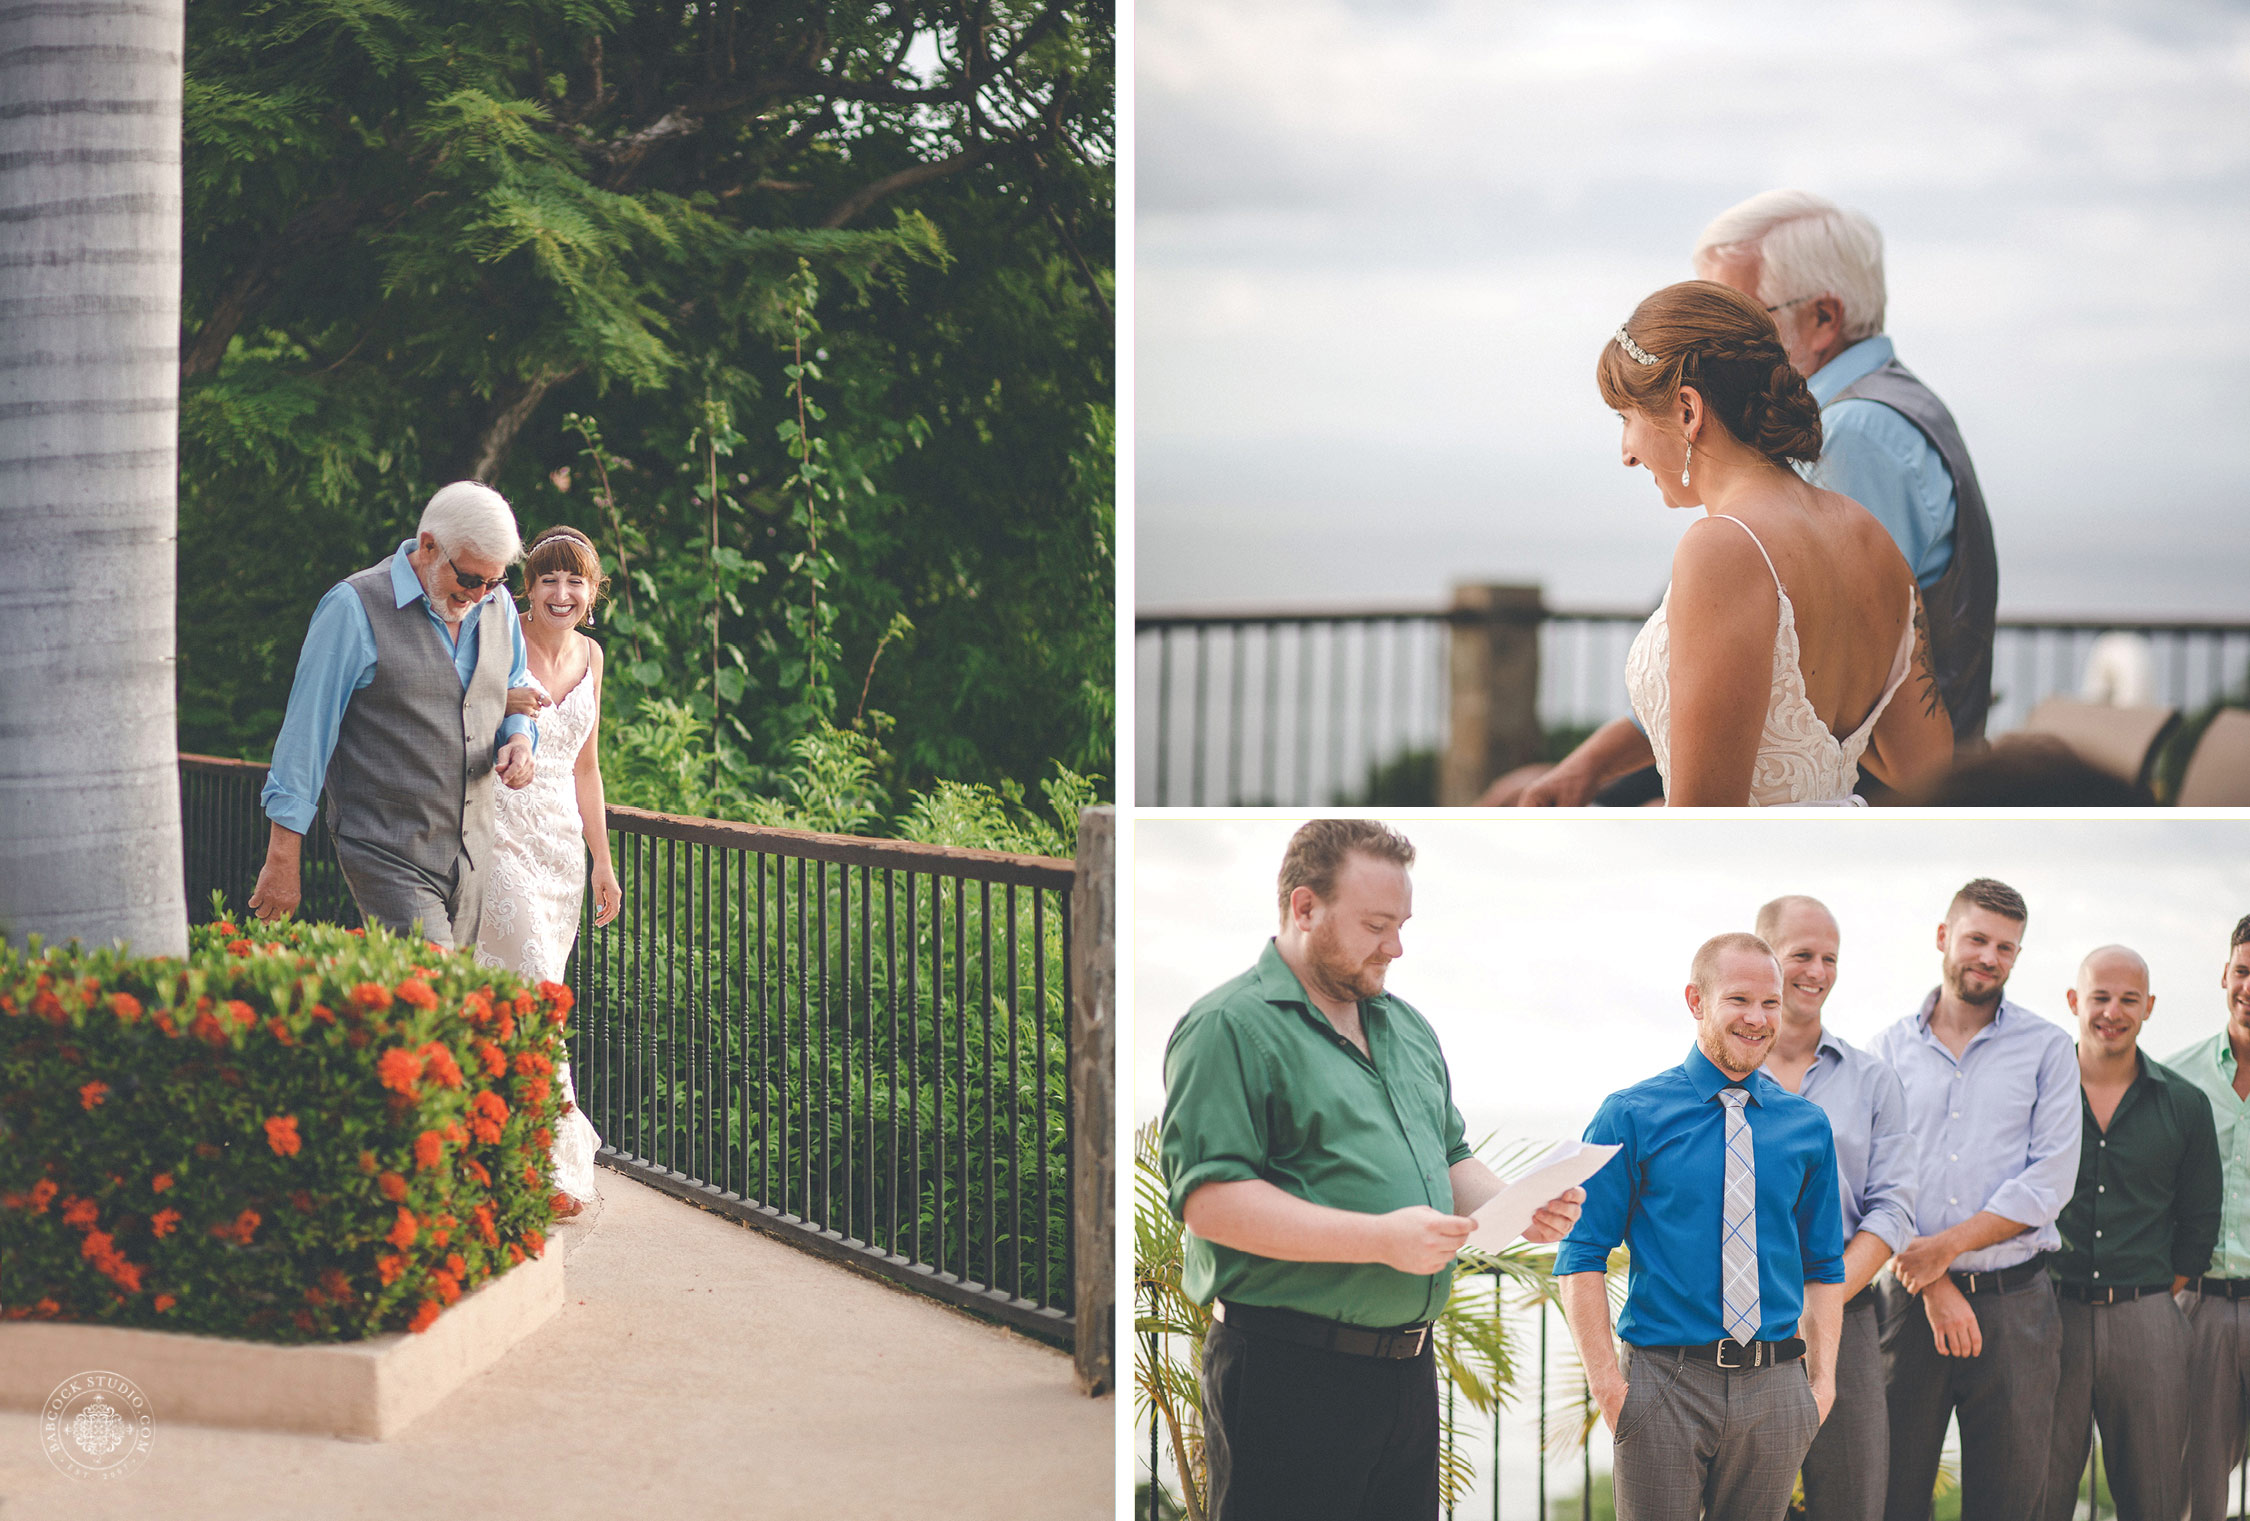 2cat-brandon-costa-rica-destination-wedding-photographer-dayton-ohio-17.jpg